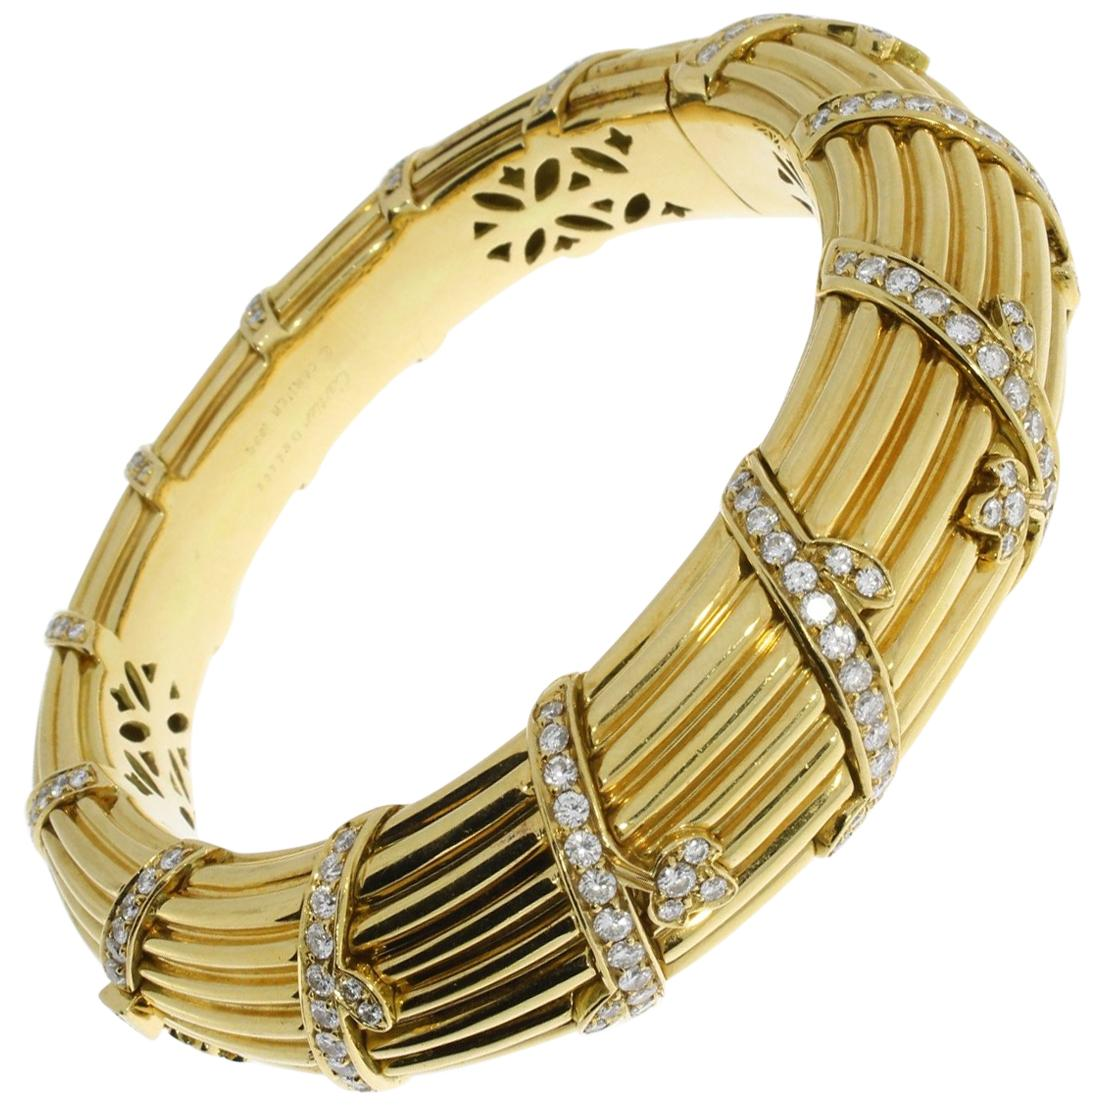 Cartier Diamond Gold Bangle Bracelet